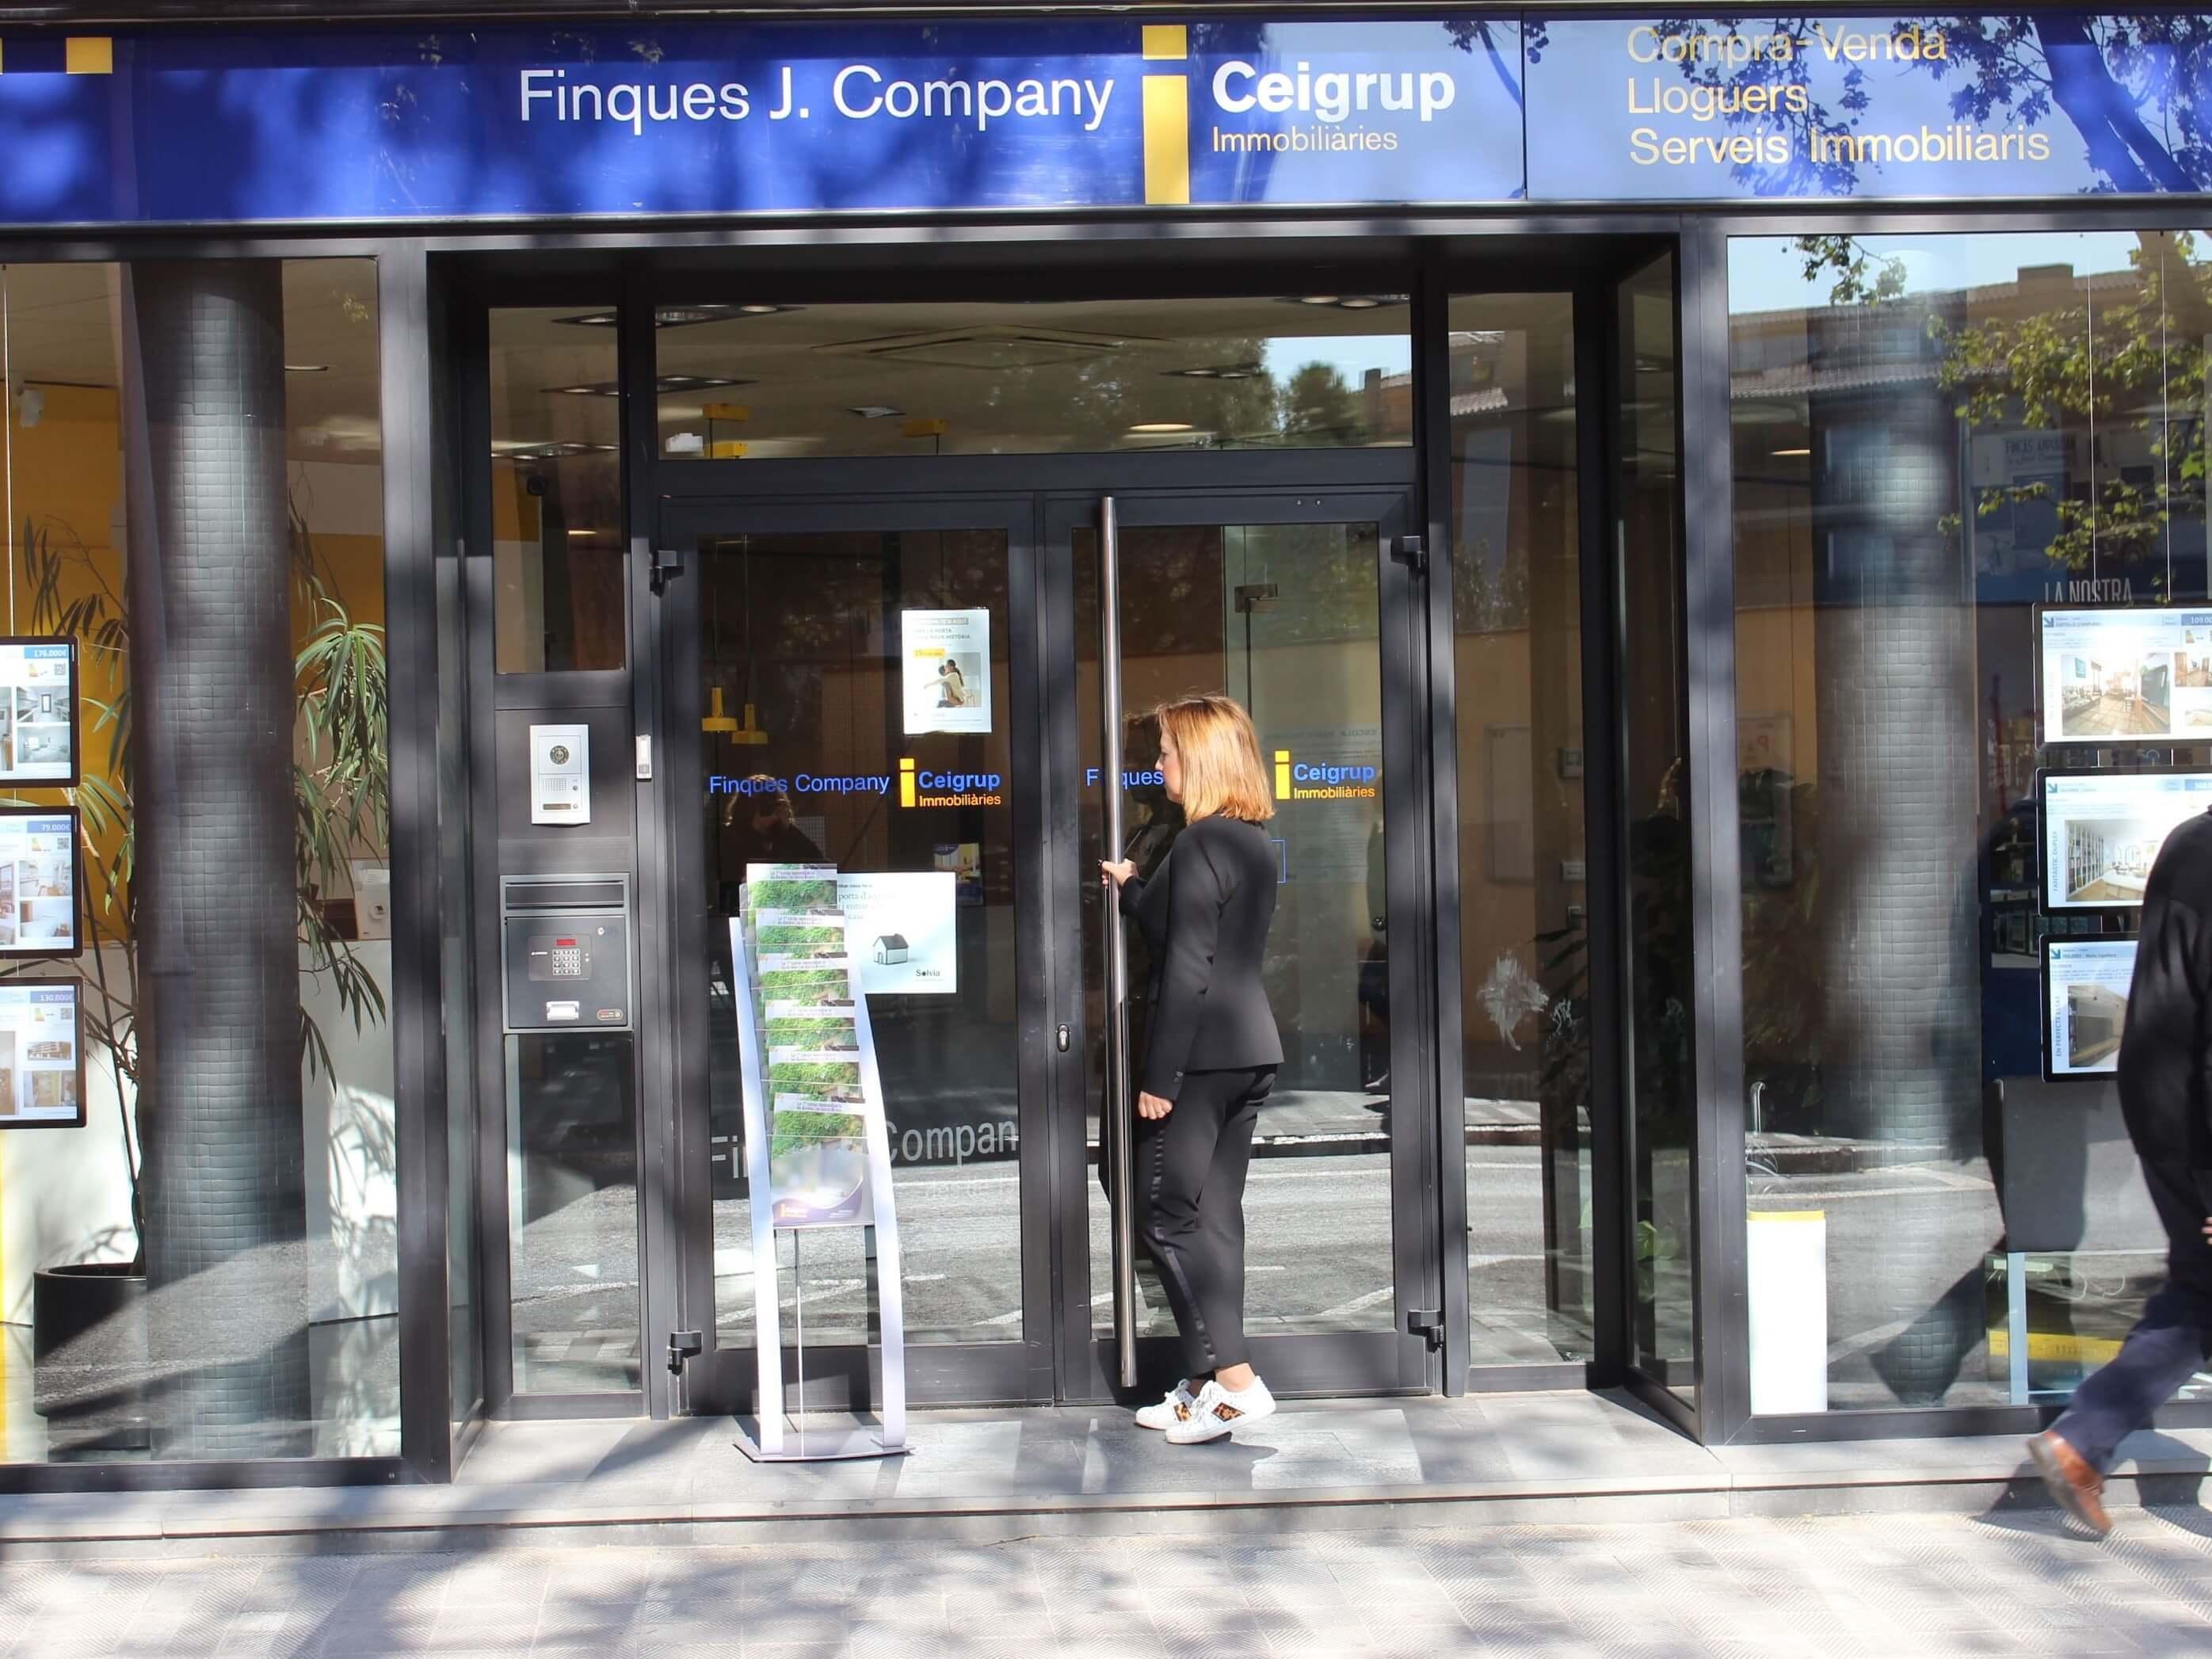 inmobiliaria Figueres